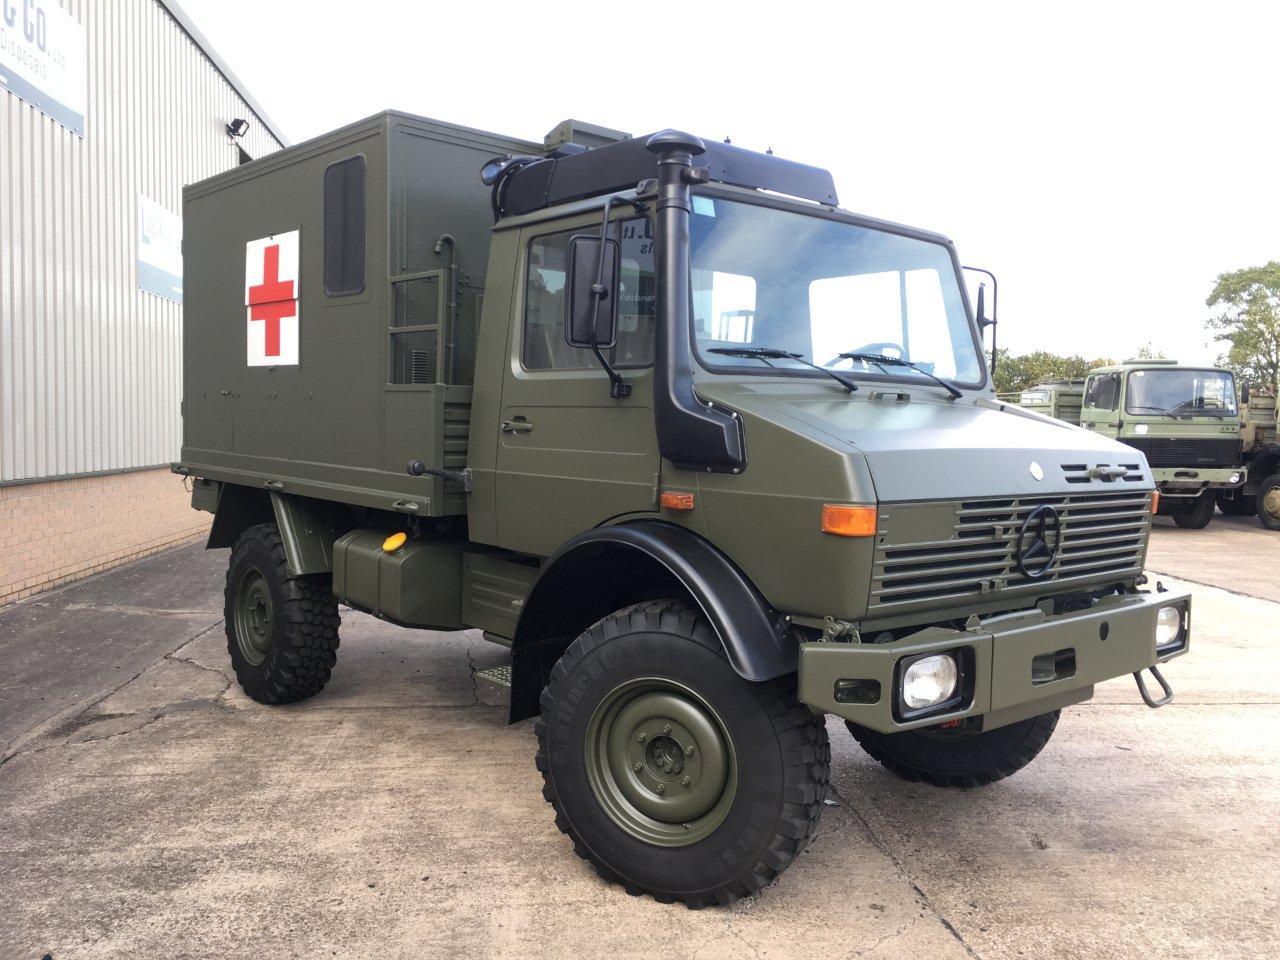 Mercedes Benz Unimog U1300L 4x4 Medical Ambulance for sale | military vehicles